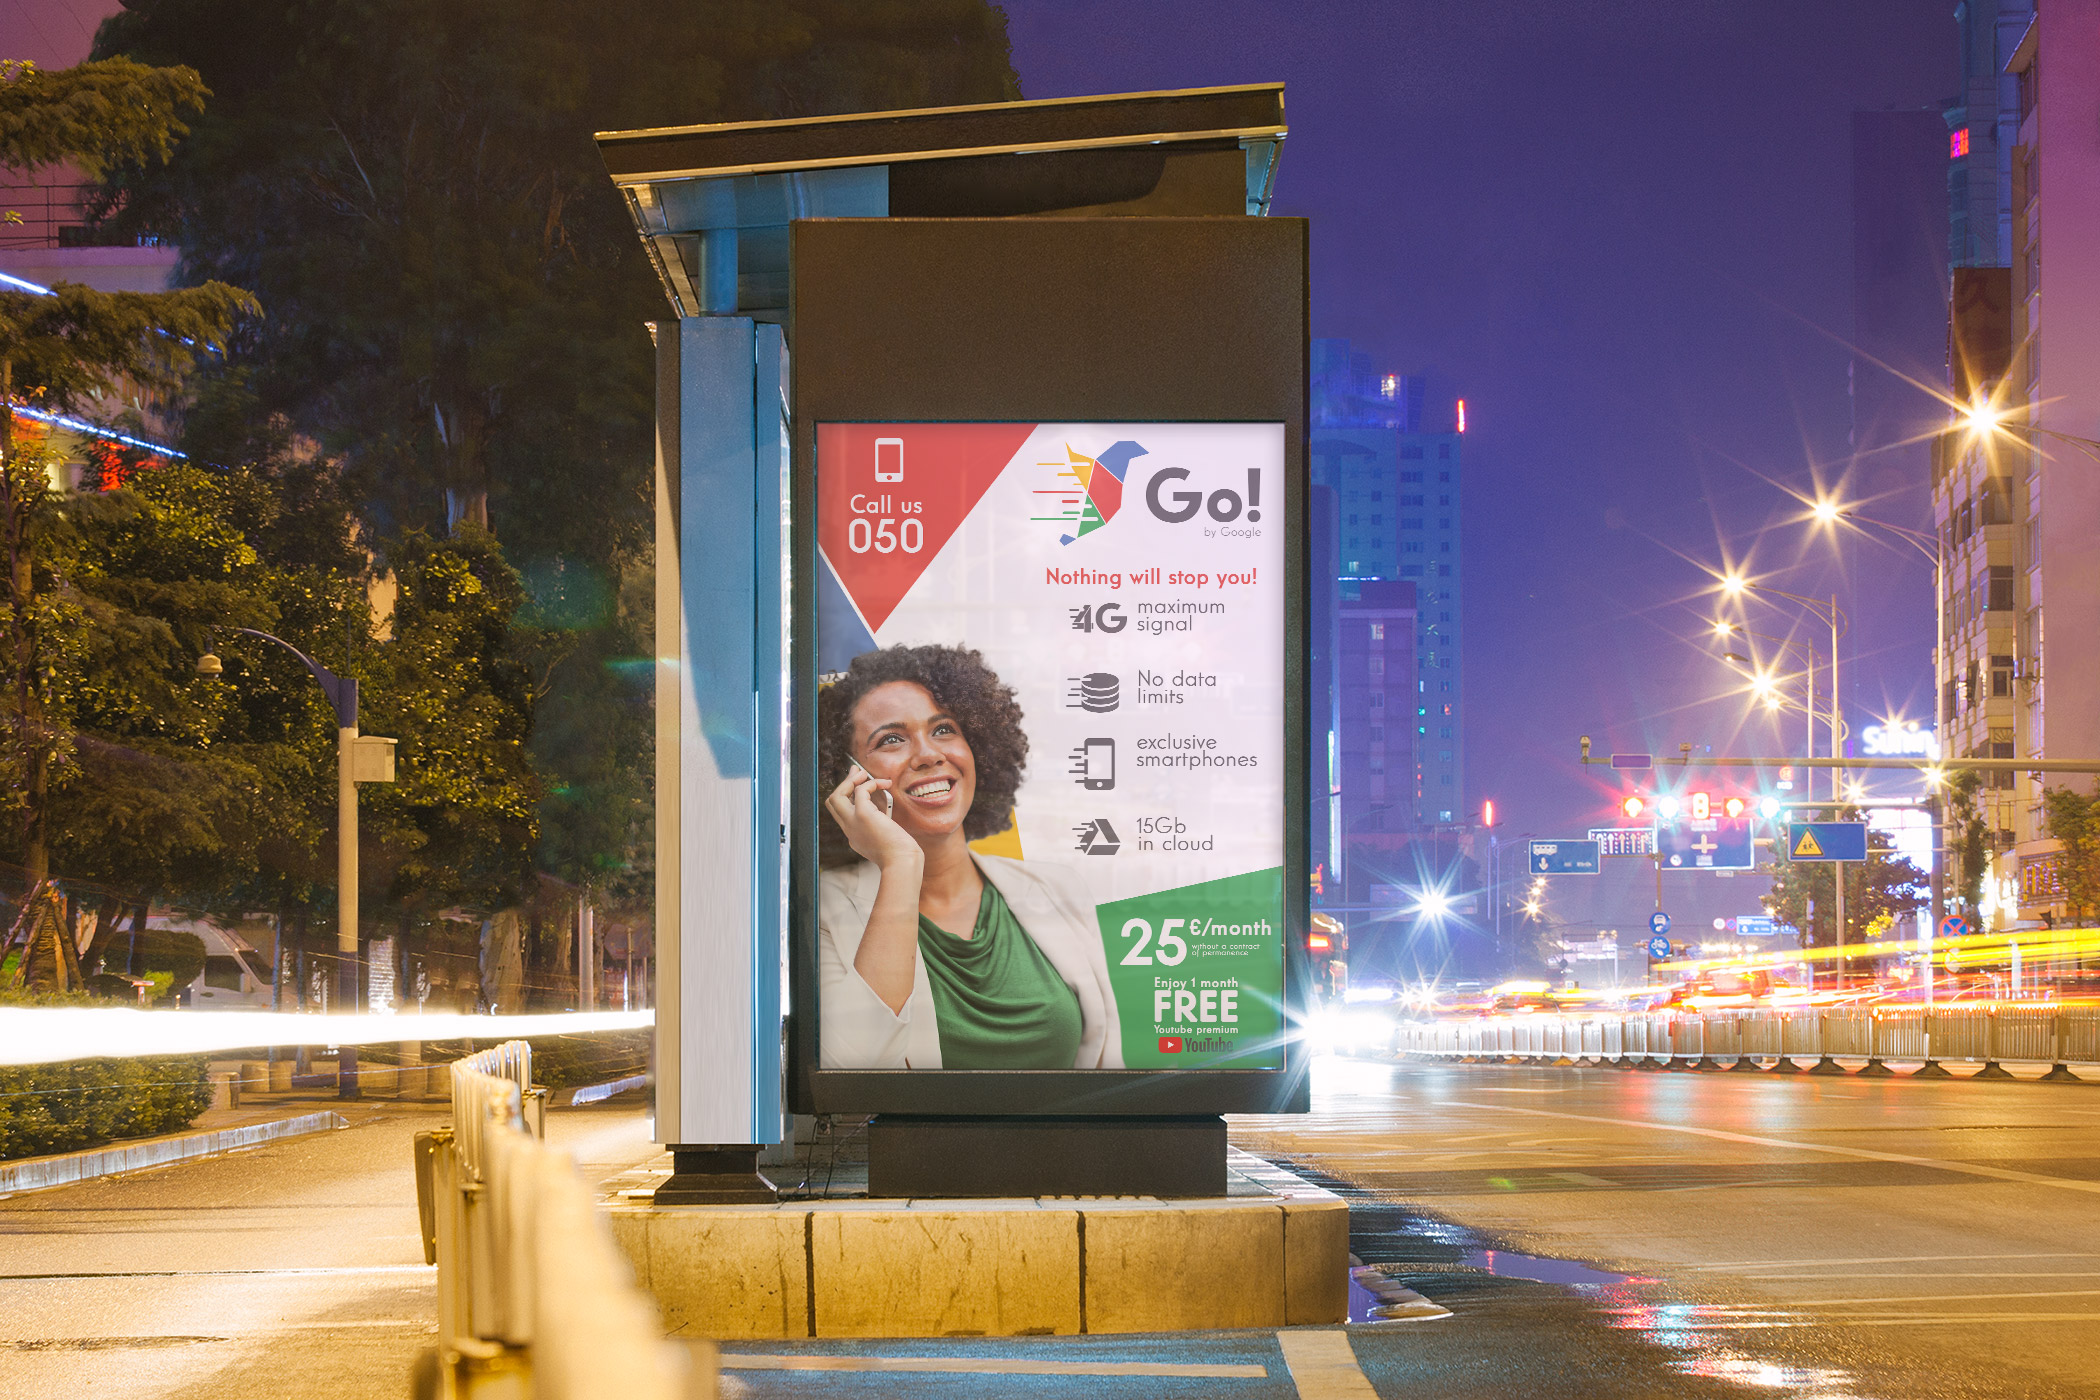 Mobile virtual operator Go! Google